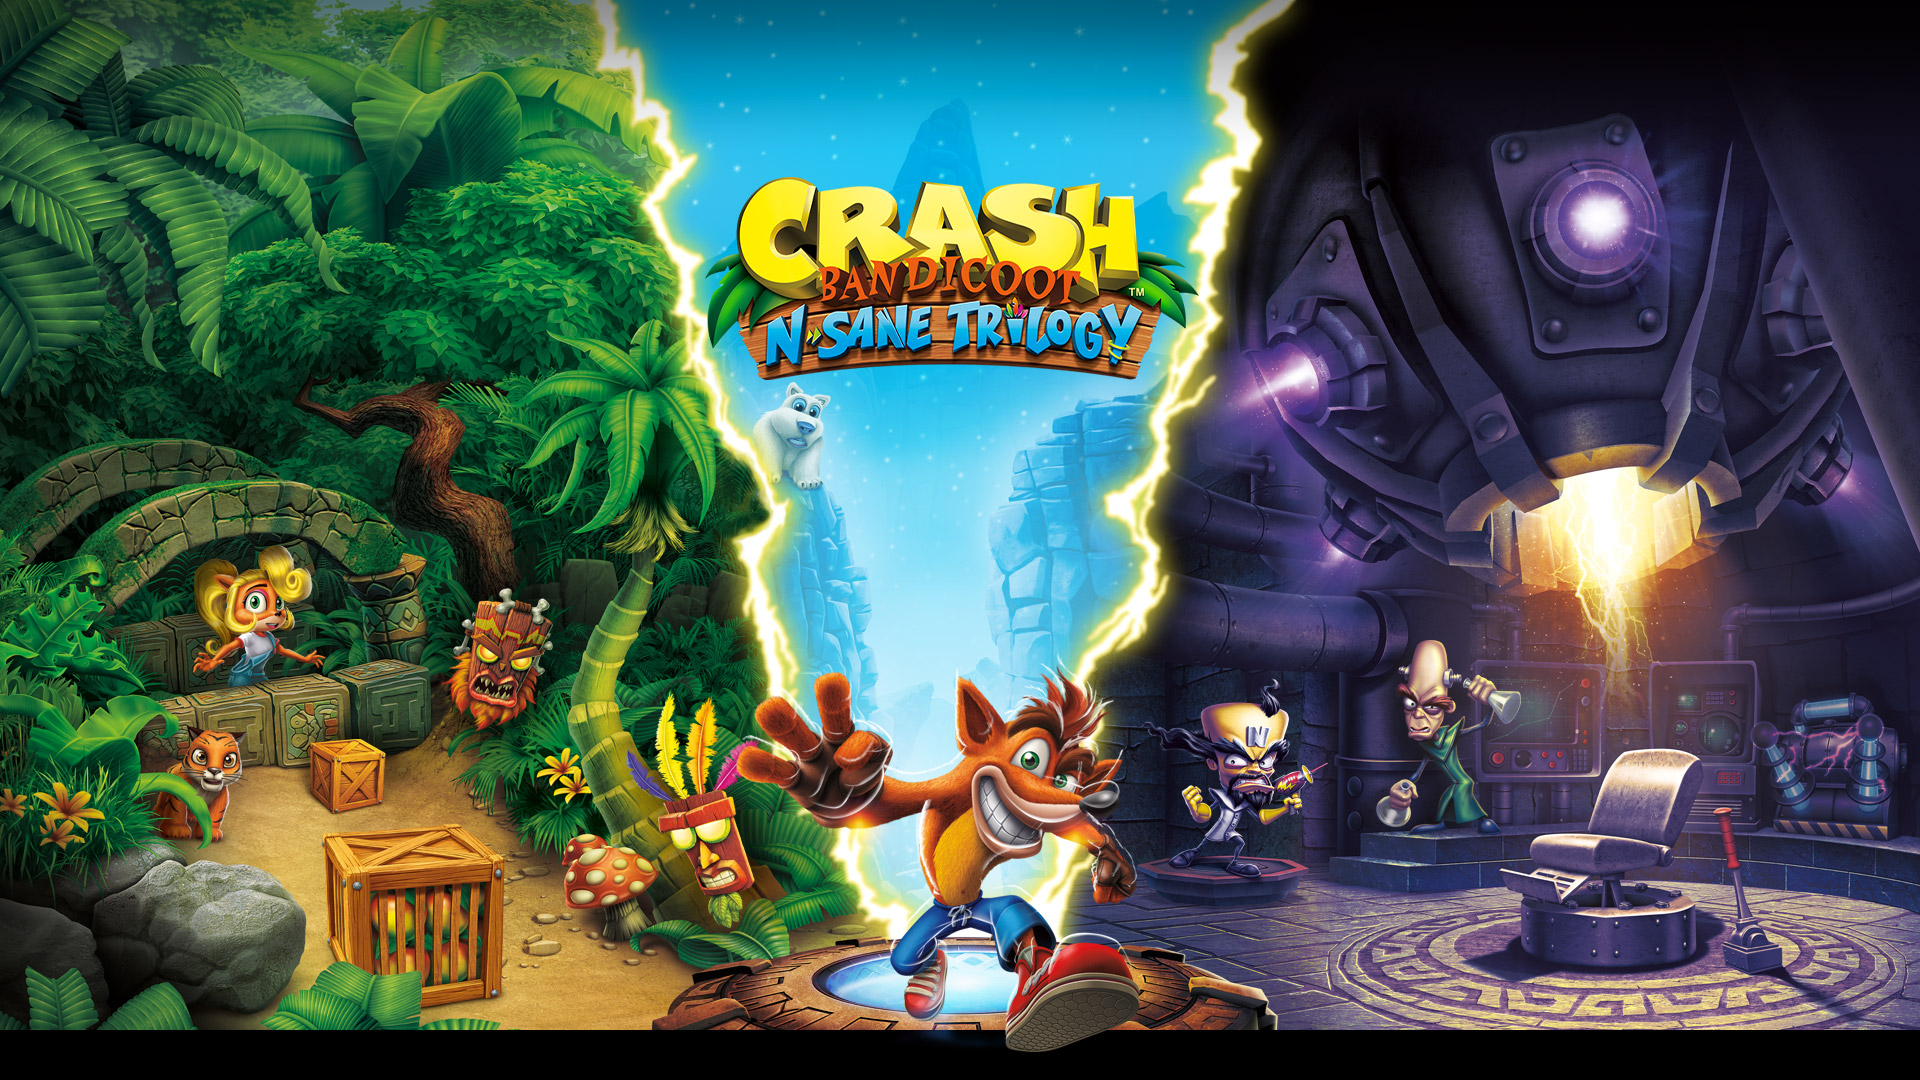 Crash Bandicoot insane trilogy, Crash stands between insanity beach and cortex's lab.